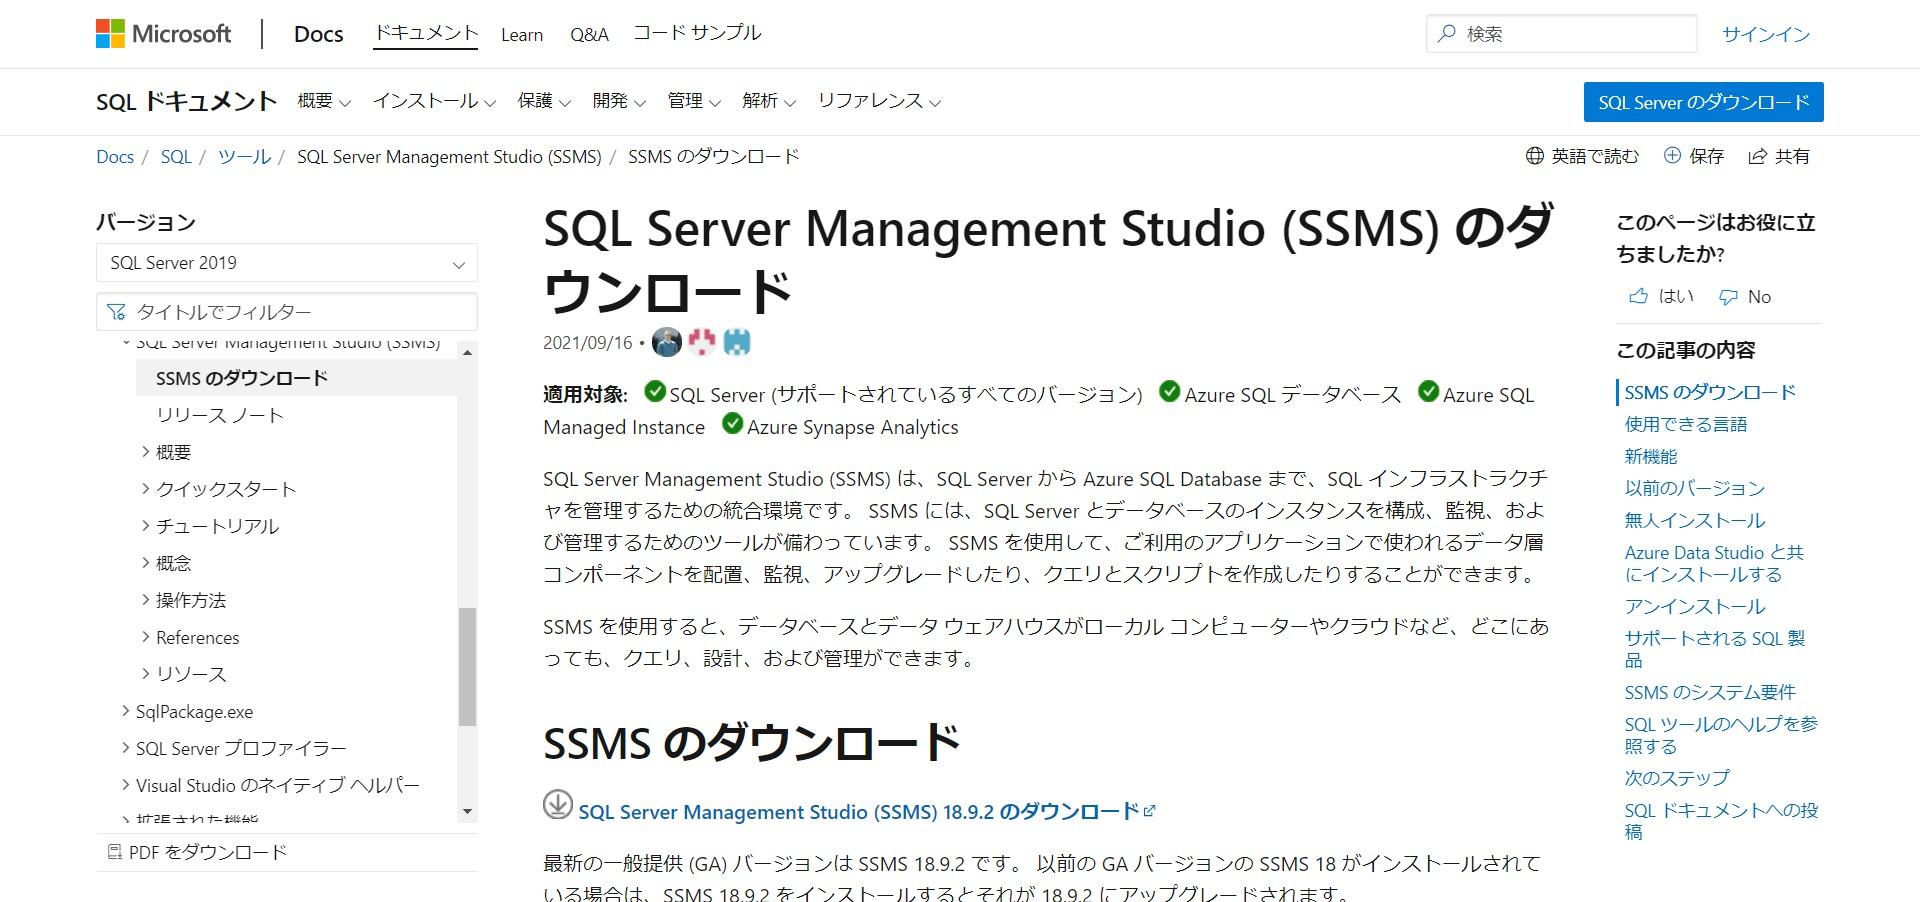 SQL Server Management Studio (SSMS) のダウンロード